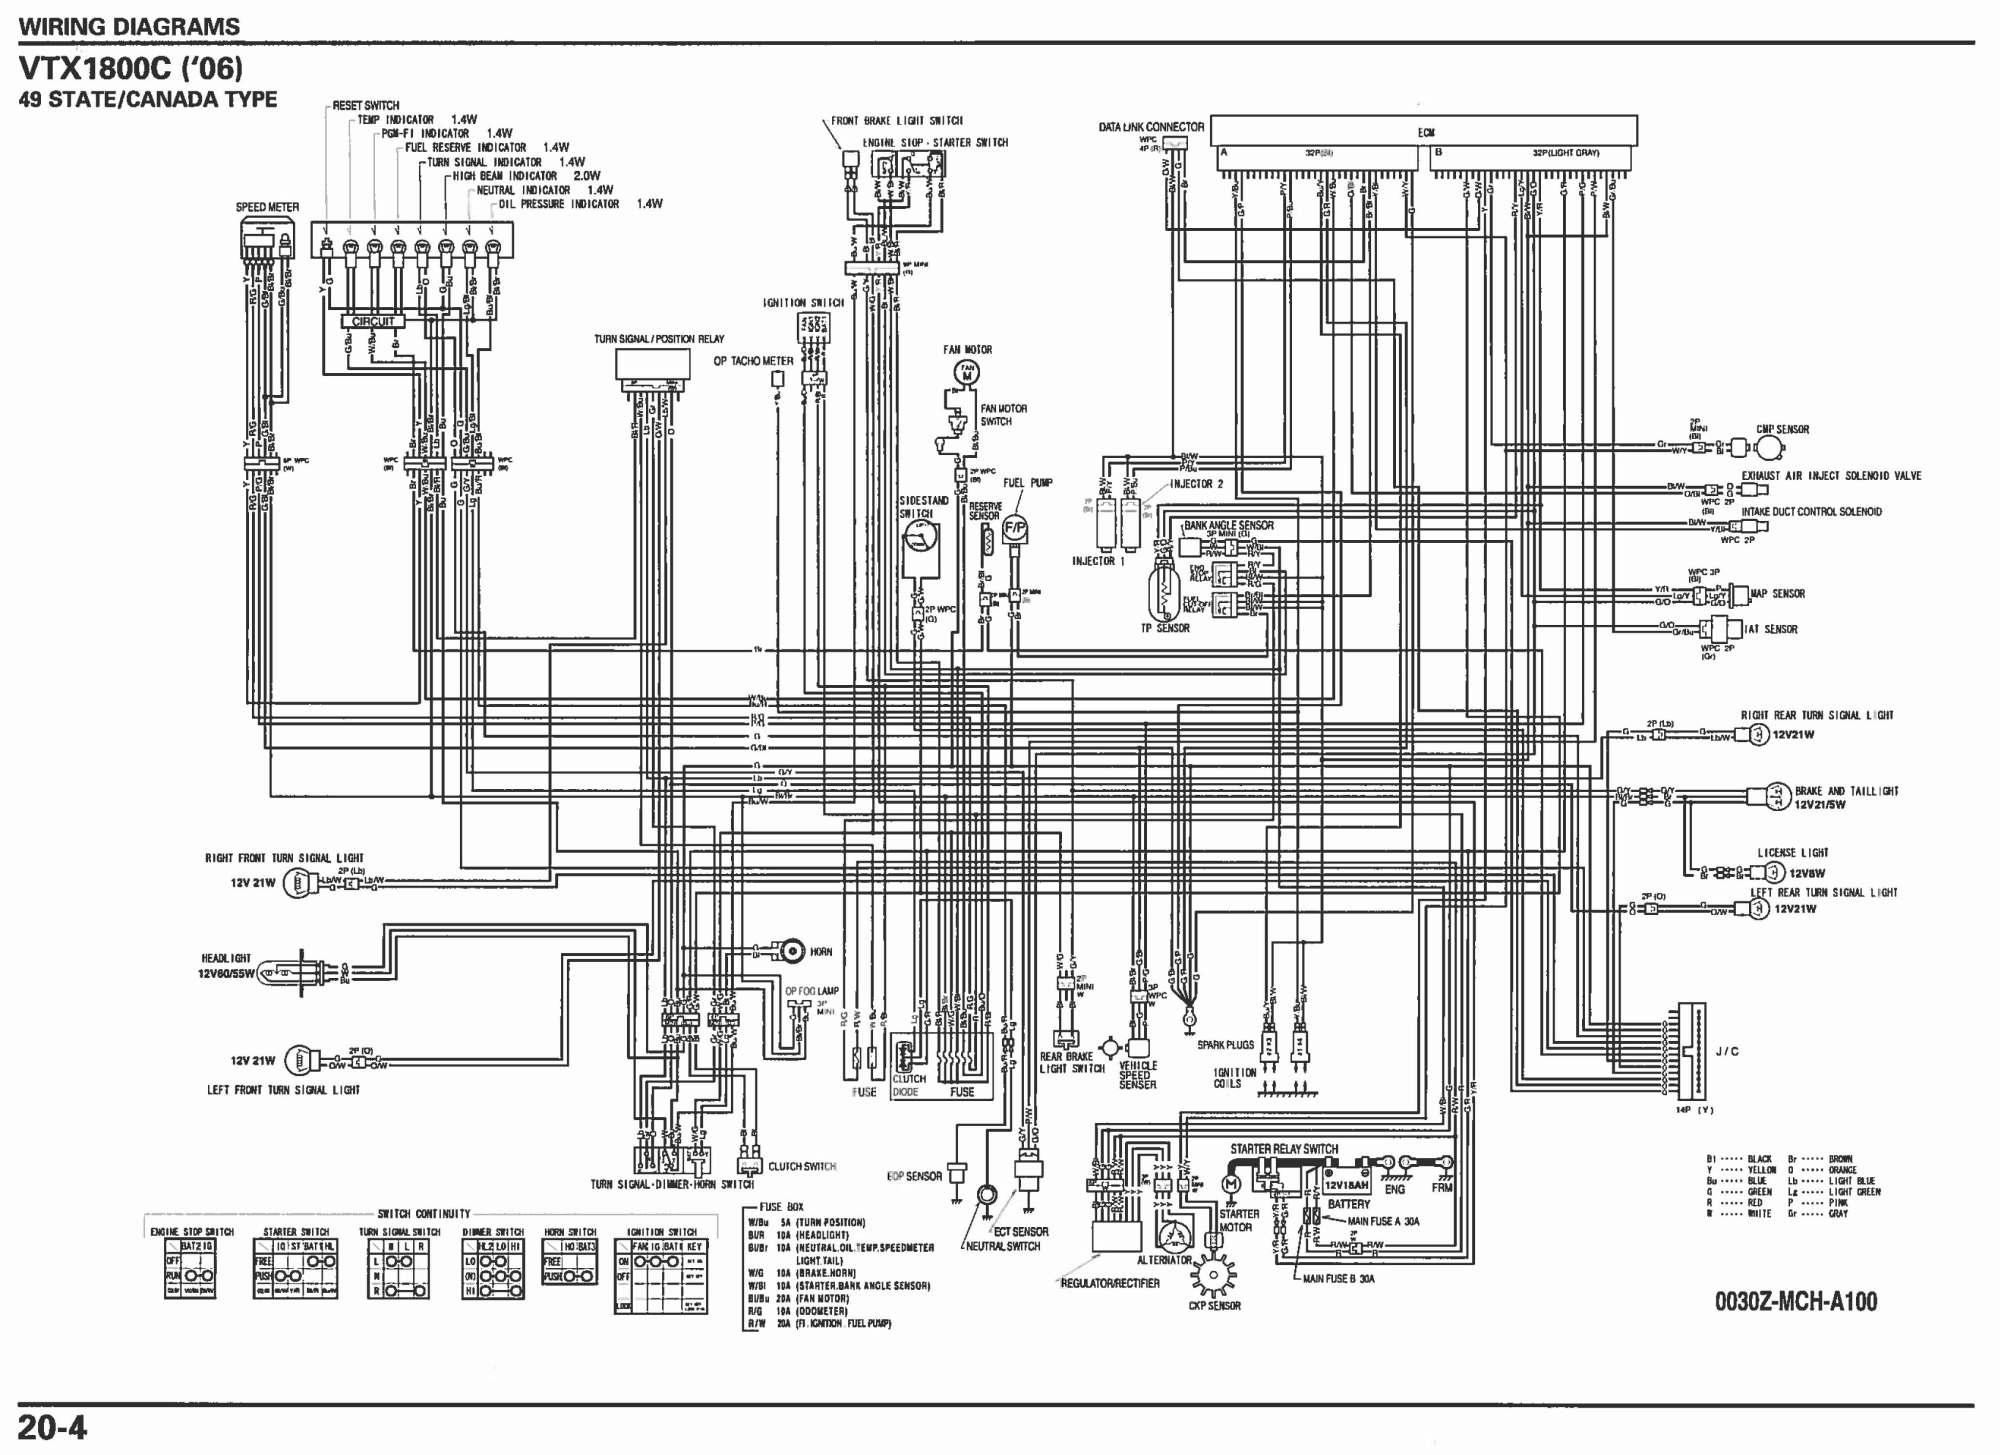 Lenkurt L239 Wiring Diagram